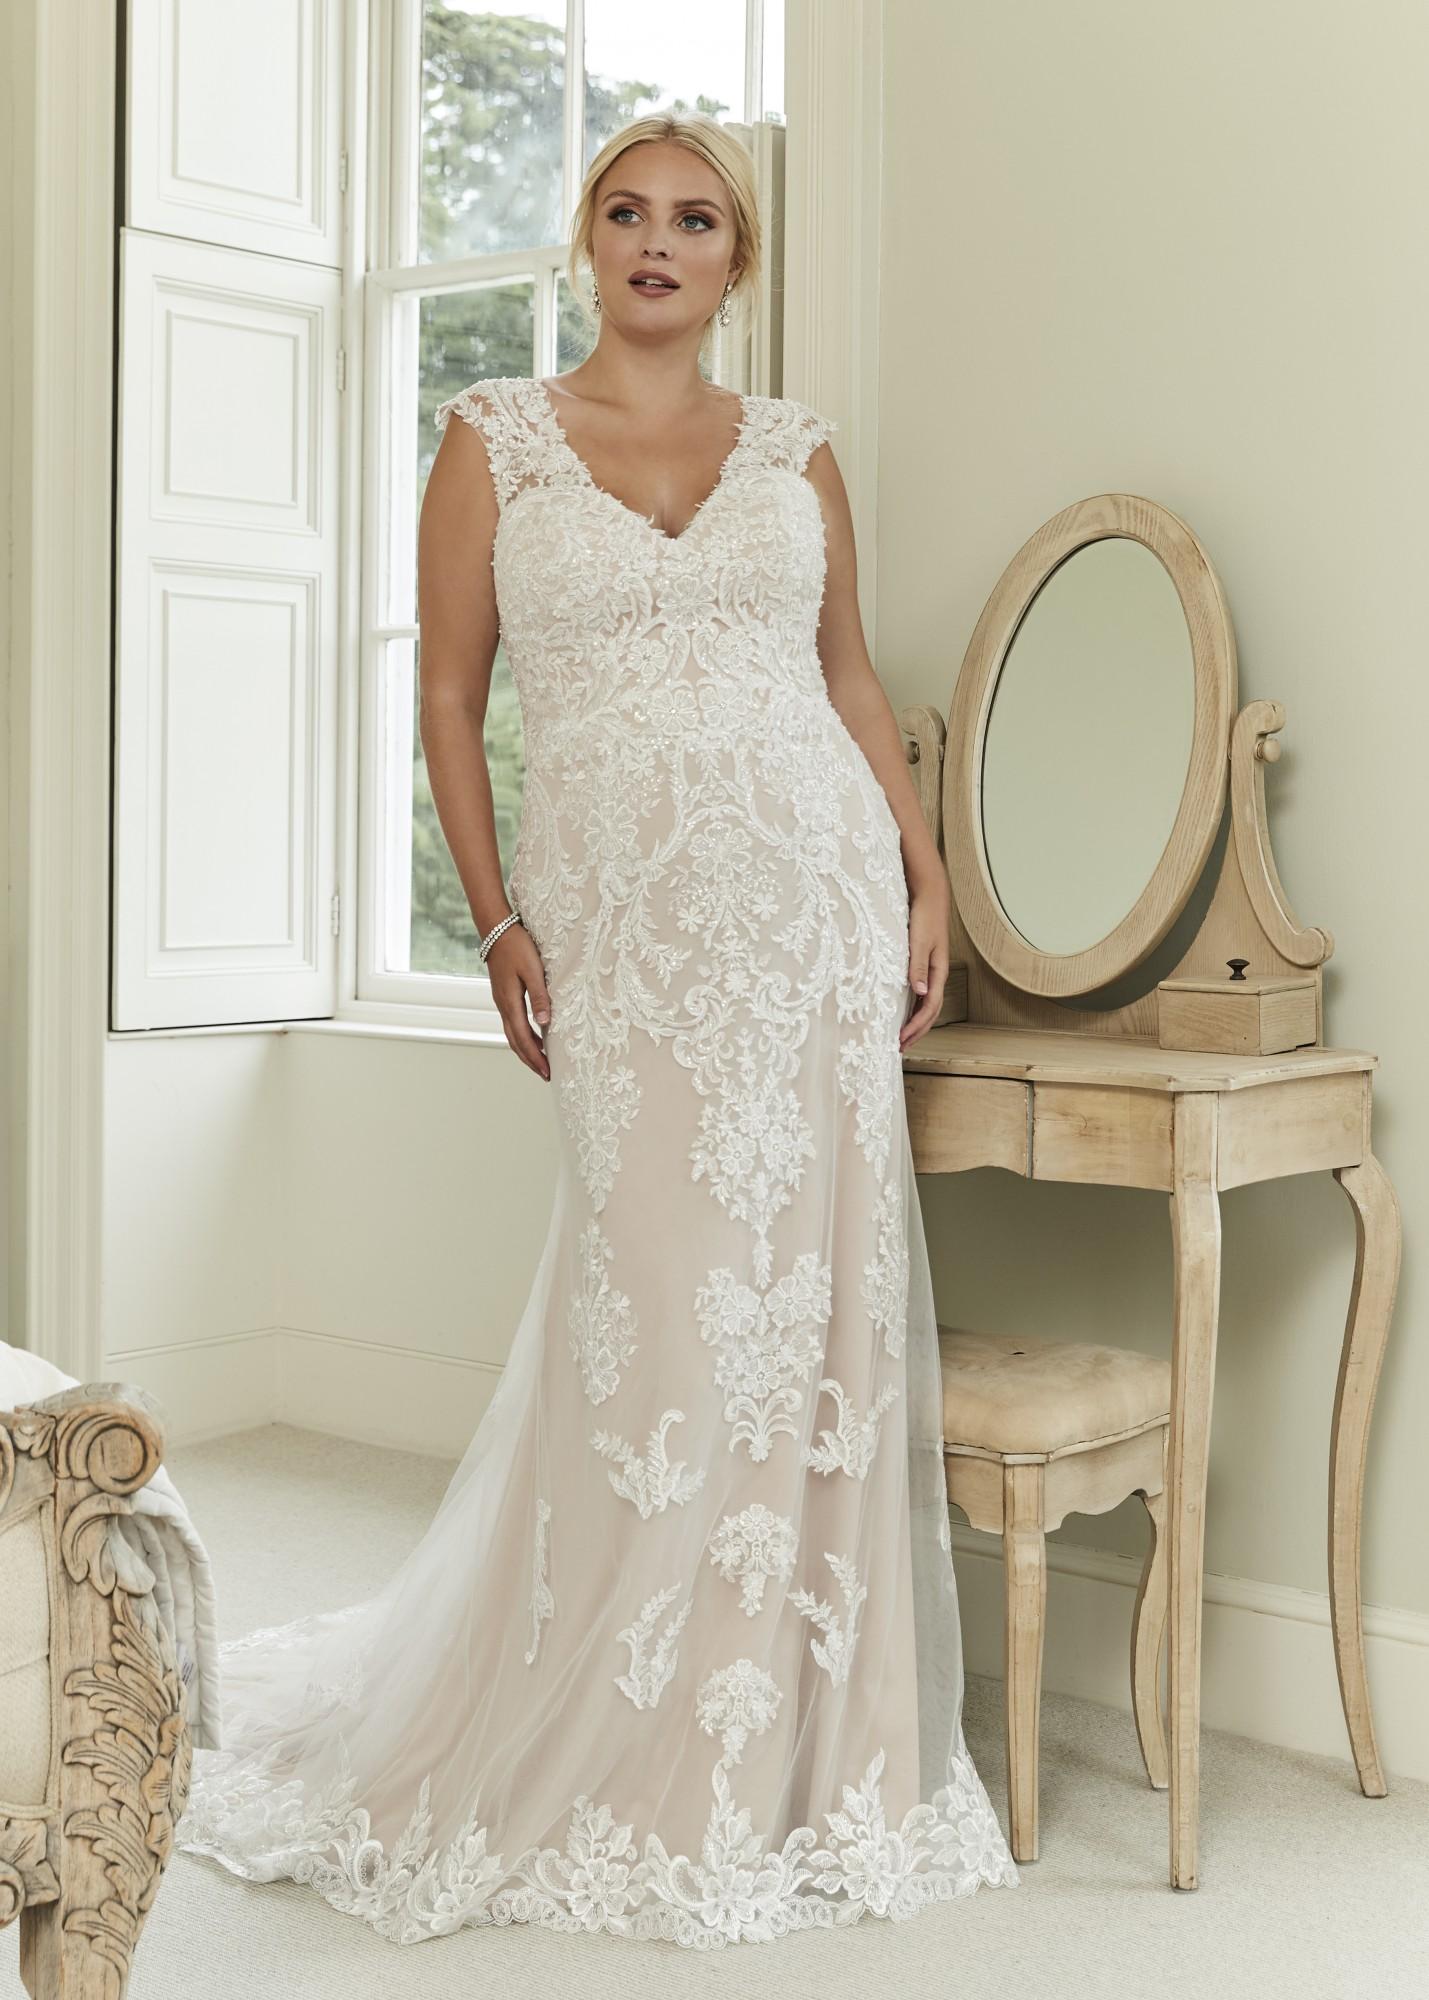 Wedding dresses in Egremont